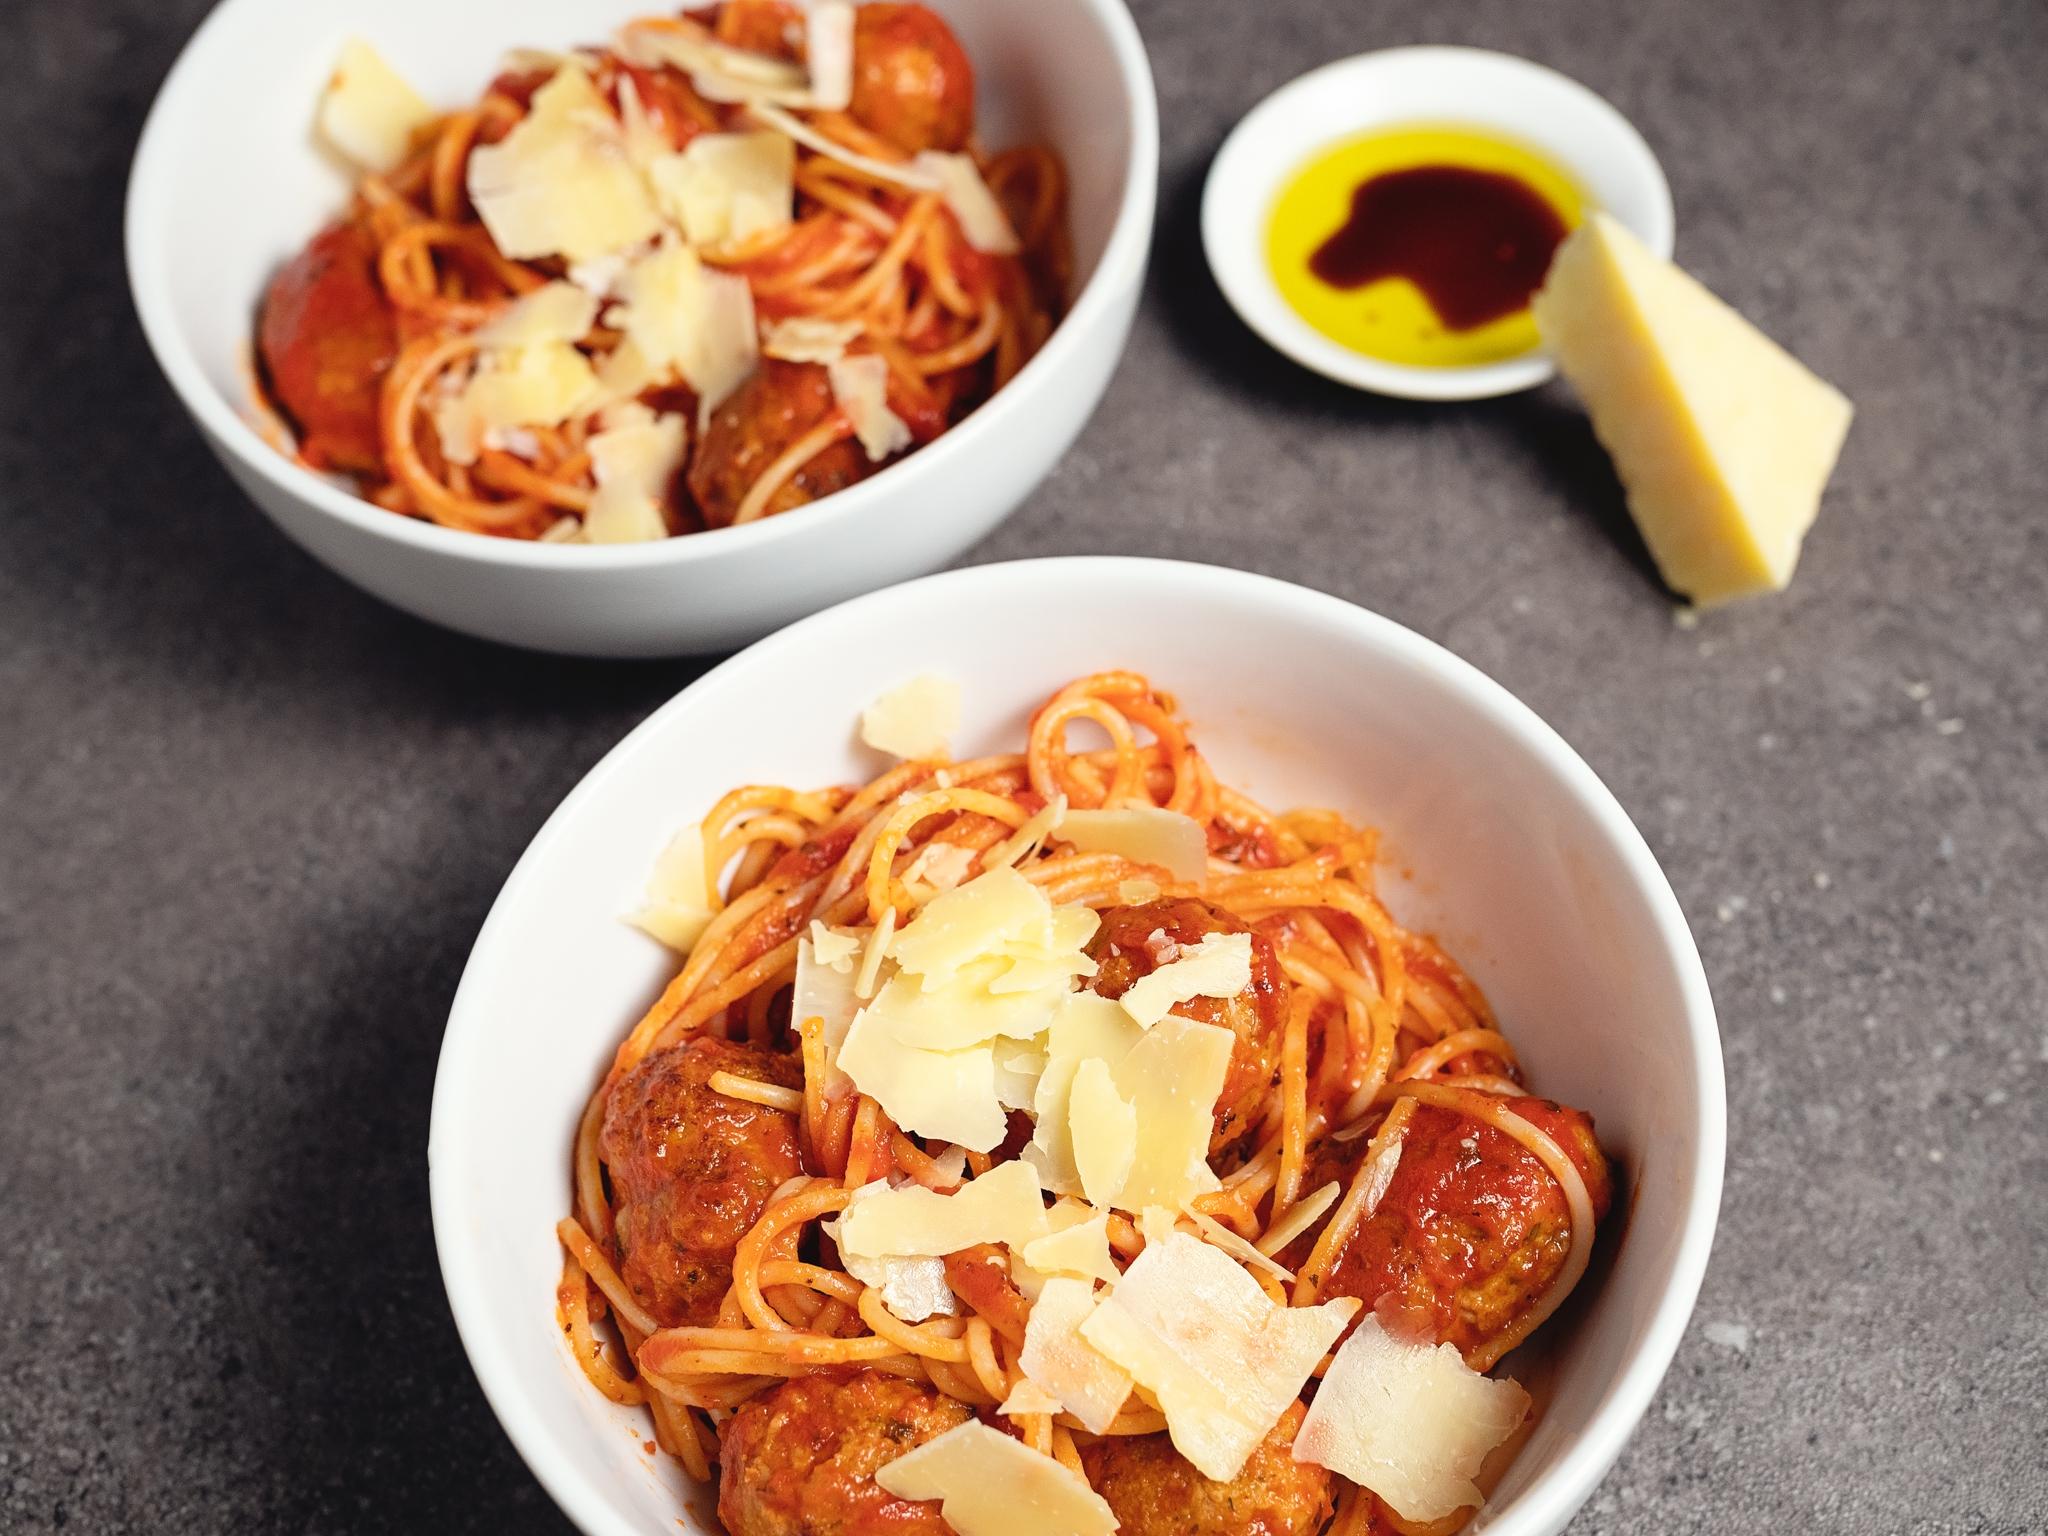 Freckle-Farm-Sausage-Meatballs-Spaghetti.jpg